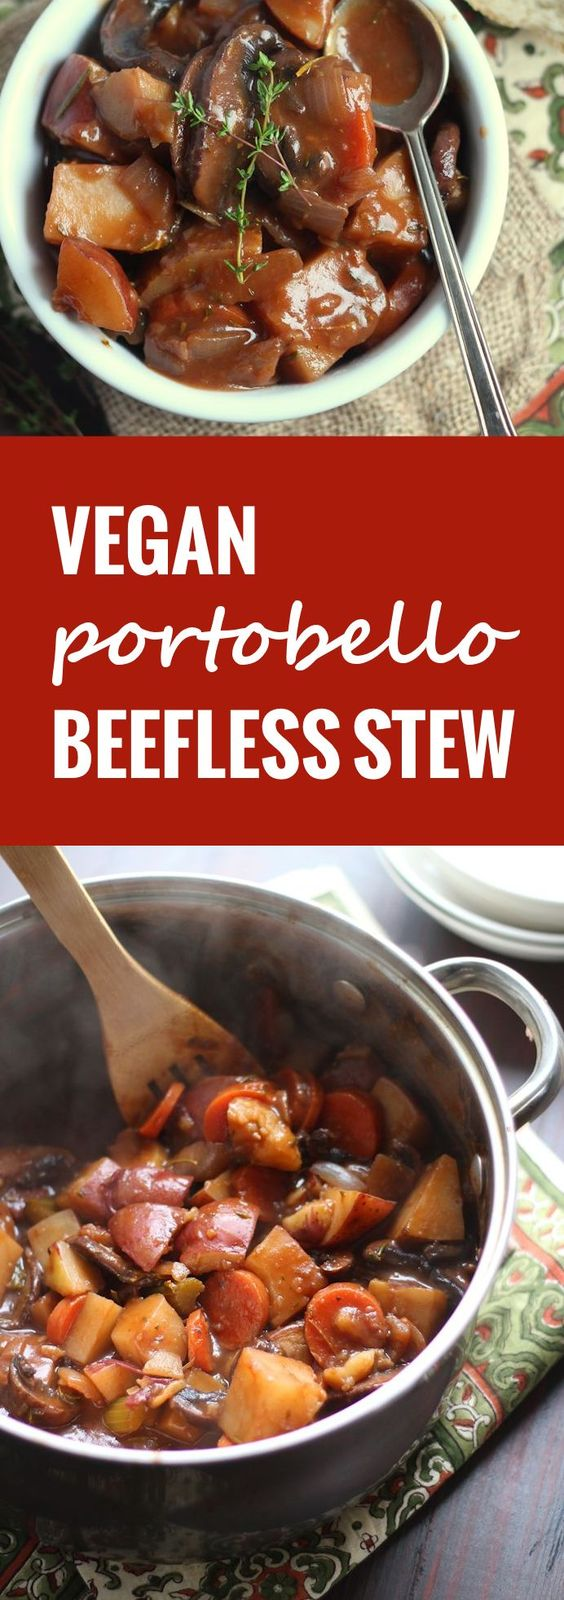 Portobello Vegan Beef(less) Stew